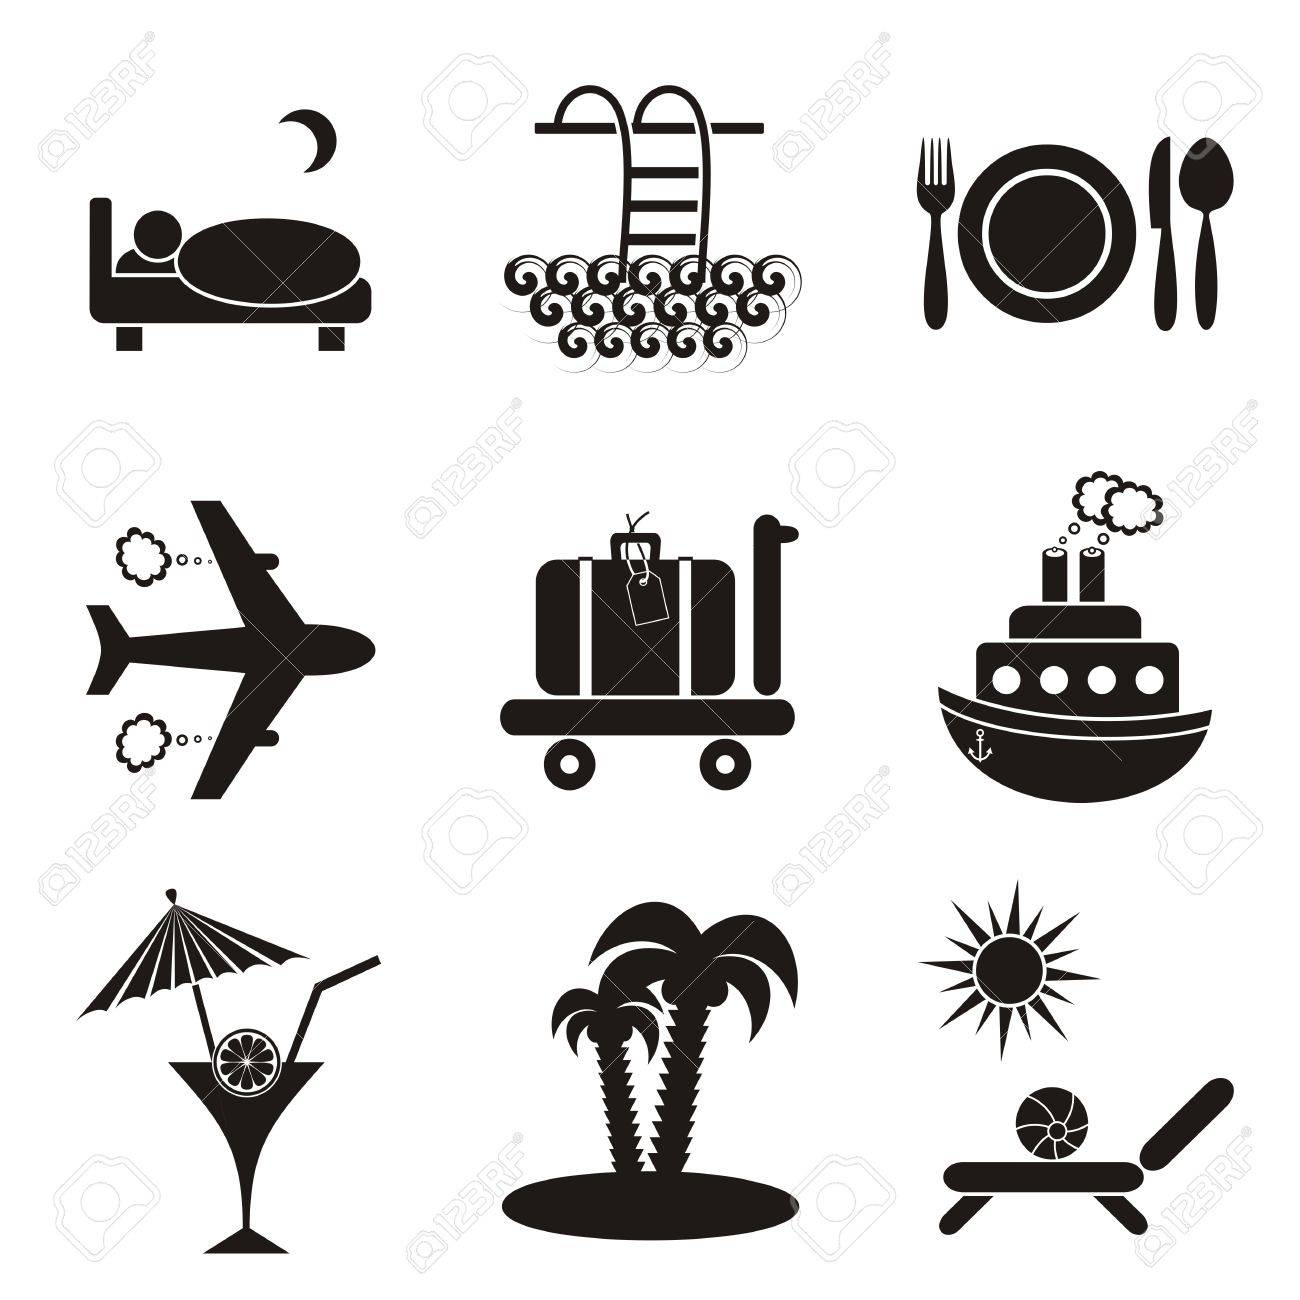 Set of nine black travelling and accommodation icons on stone-like background Stock Vector - 22560486